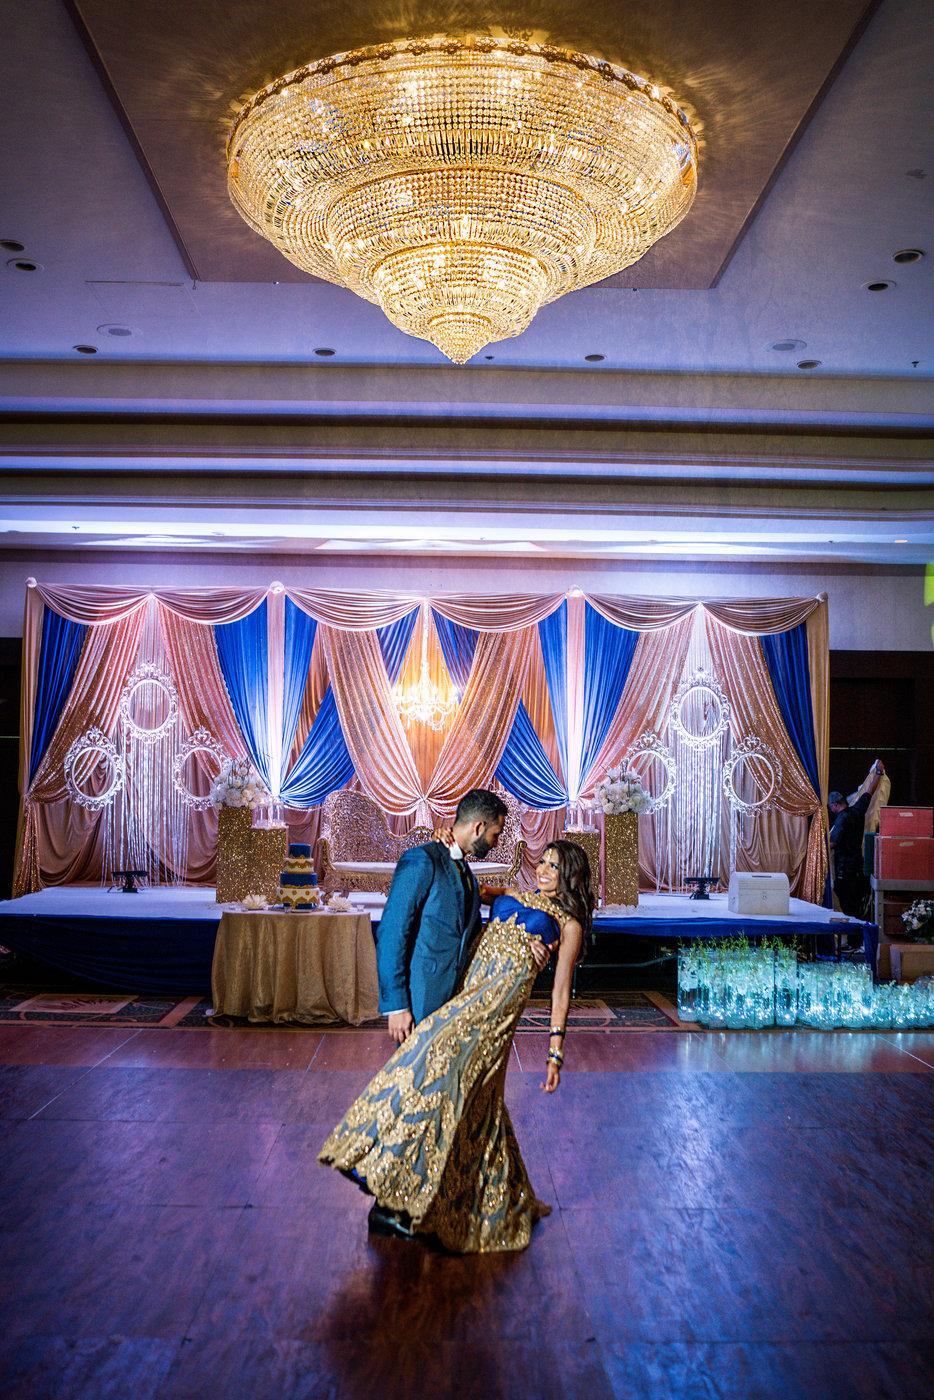 Akshar Arti Enhanced Images-Akshar Arti Enhanced Images-0060.jpg